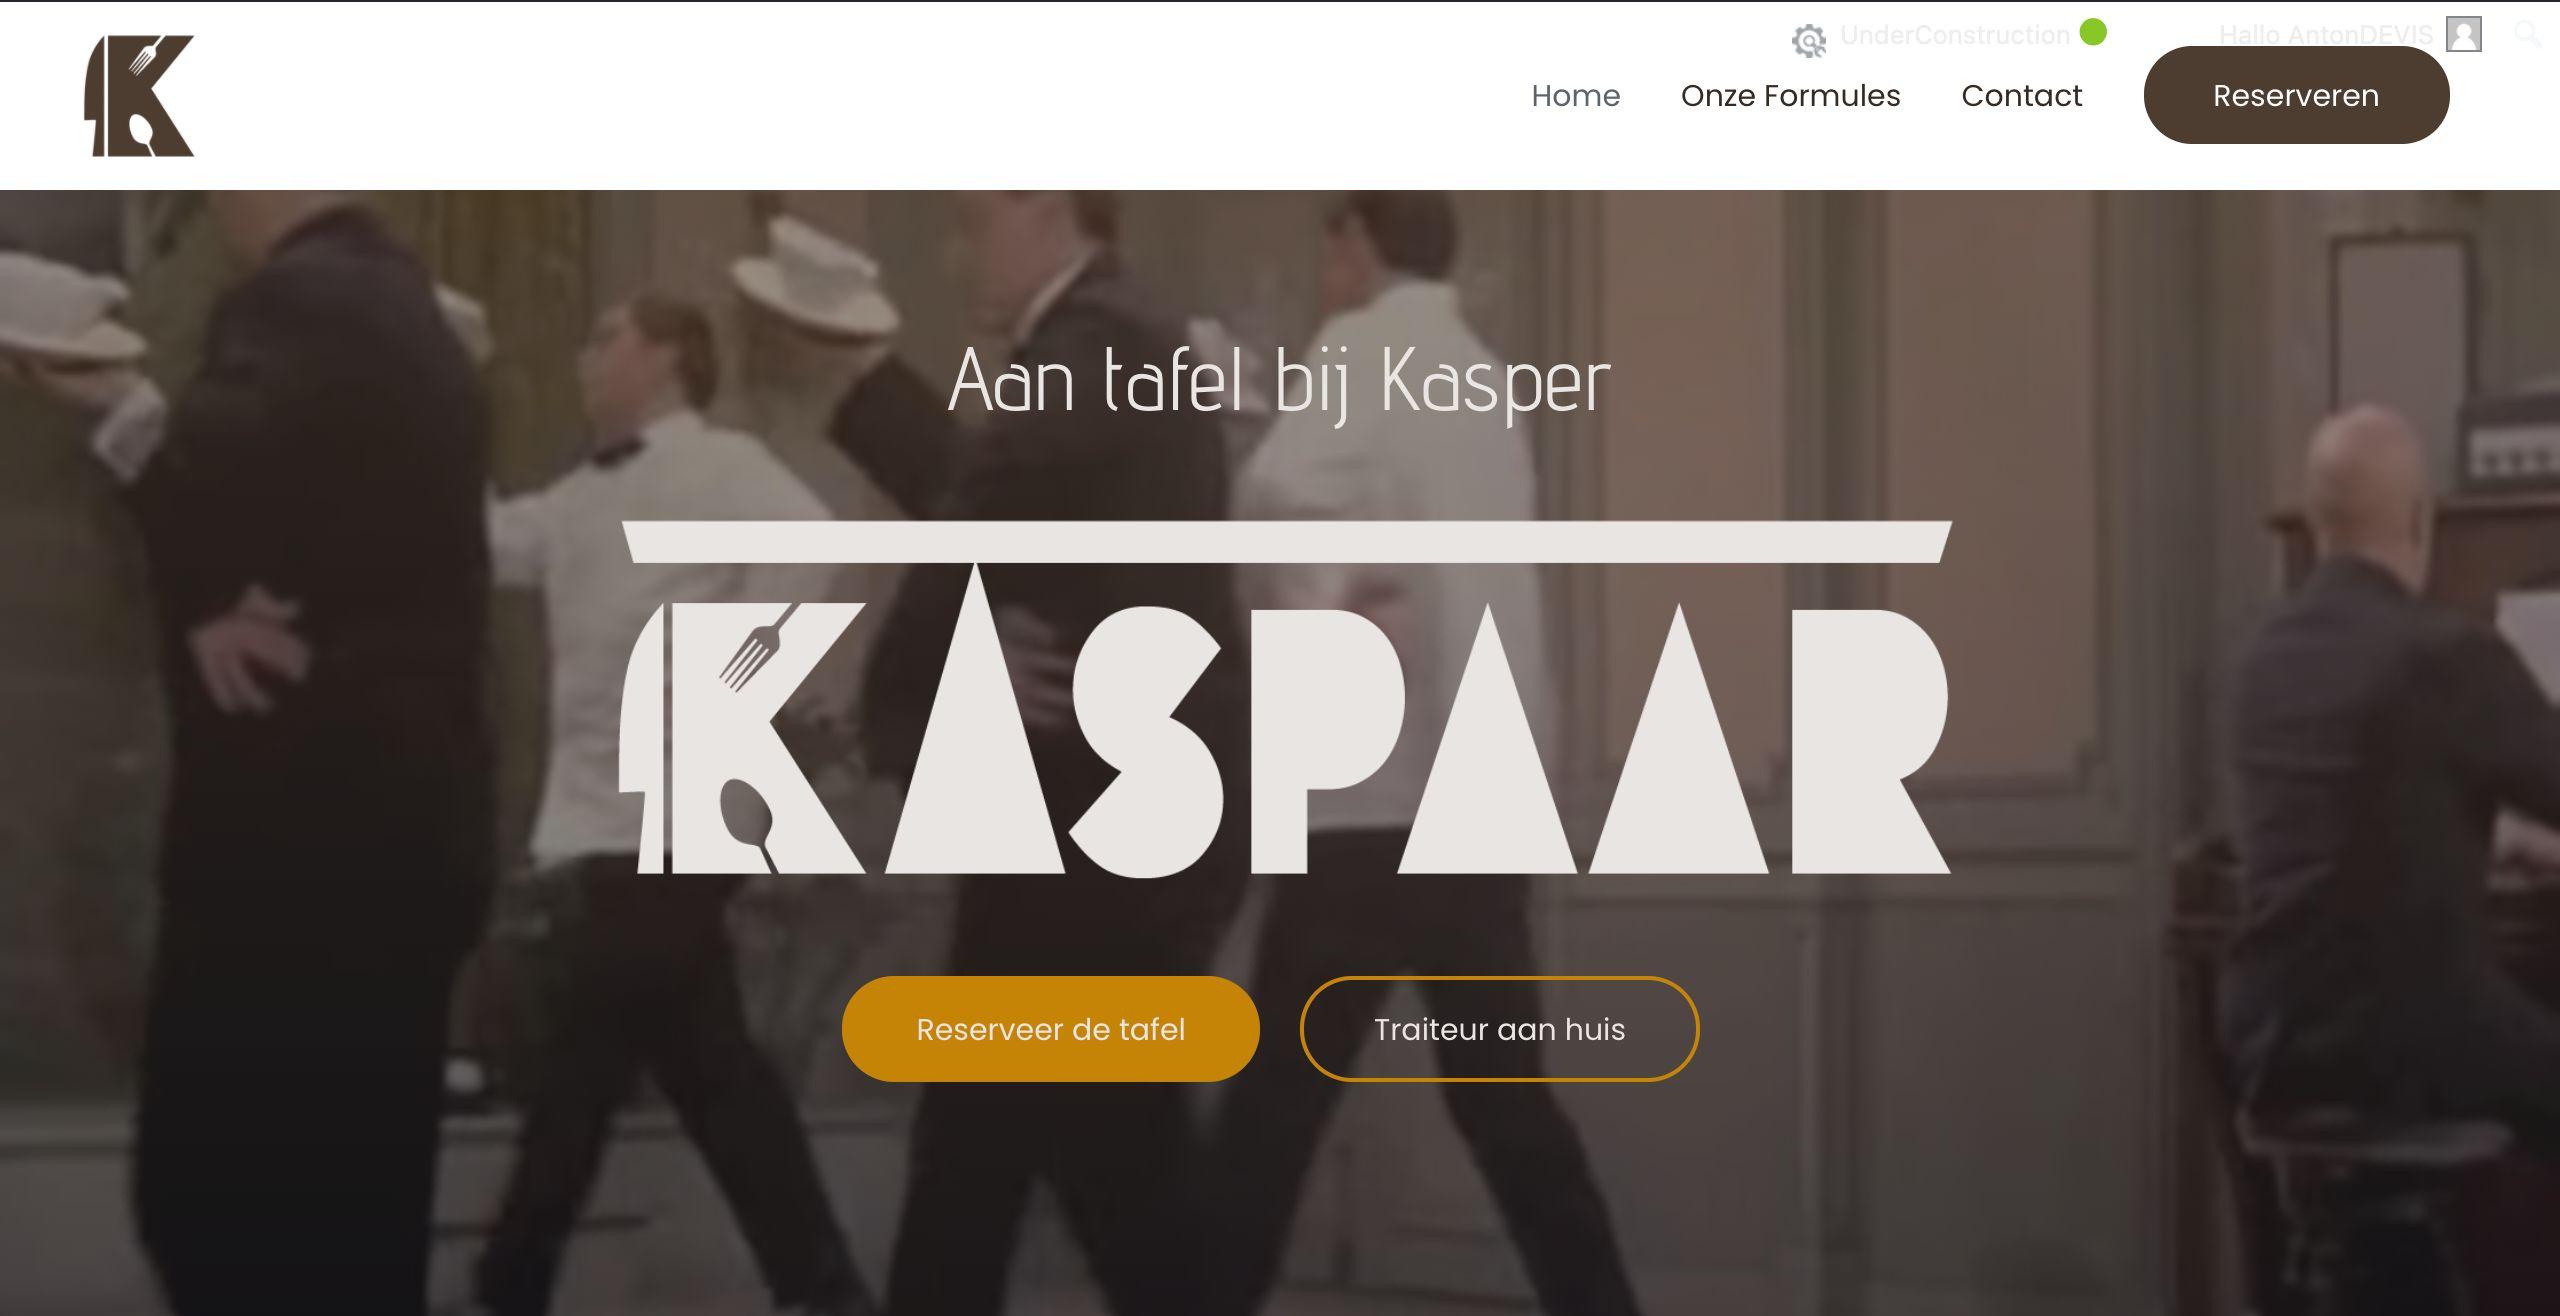 Kaspaar – Traiteur